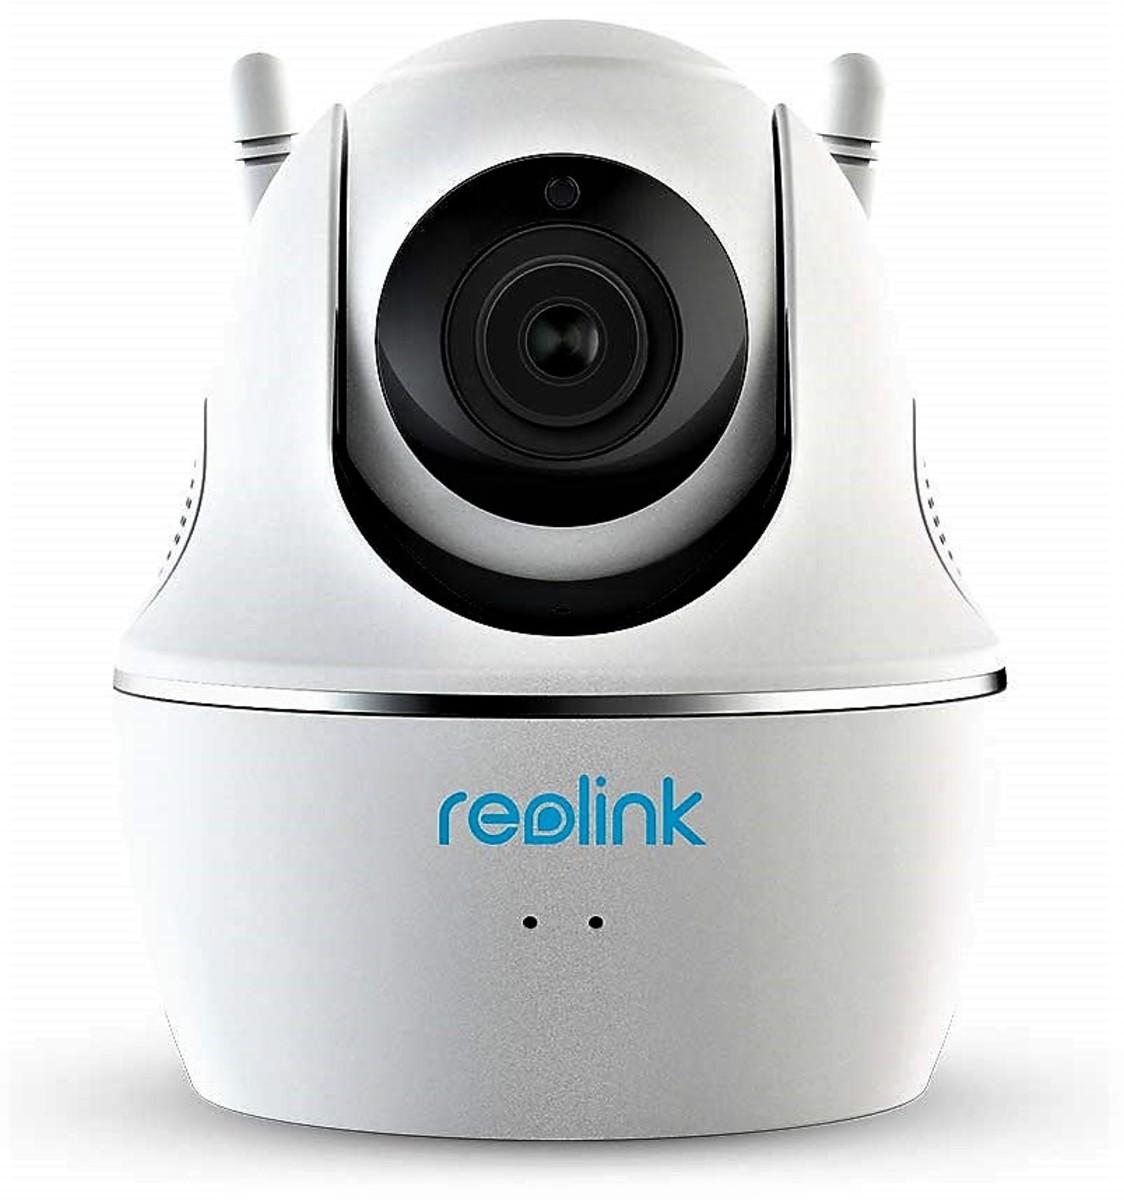 reolink-c2-pro-the-best-indoor-smart-security-camera